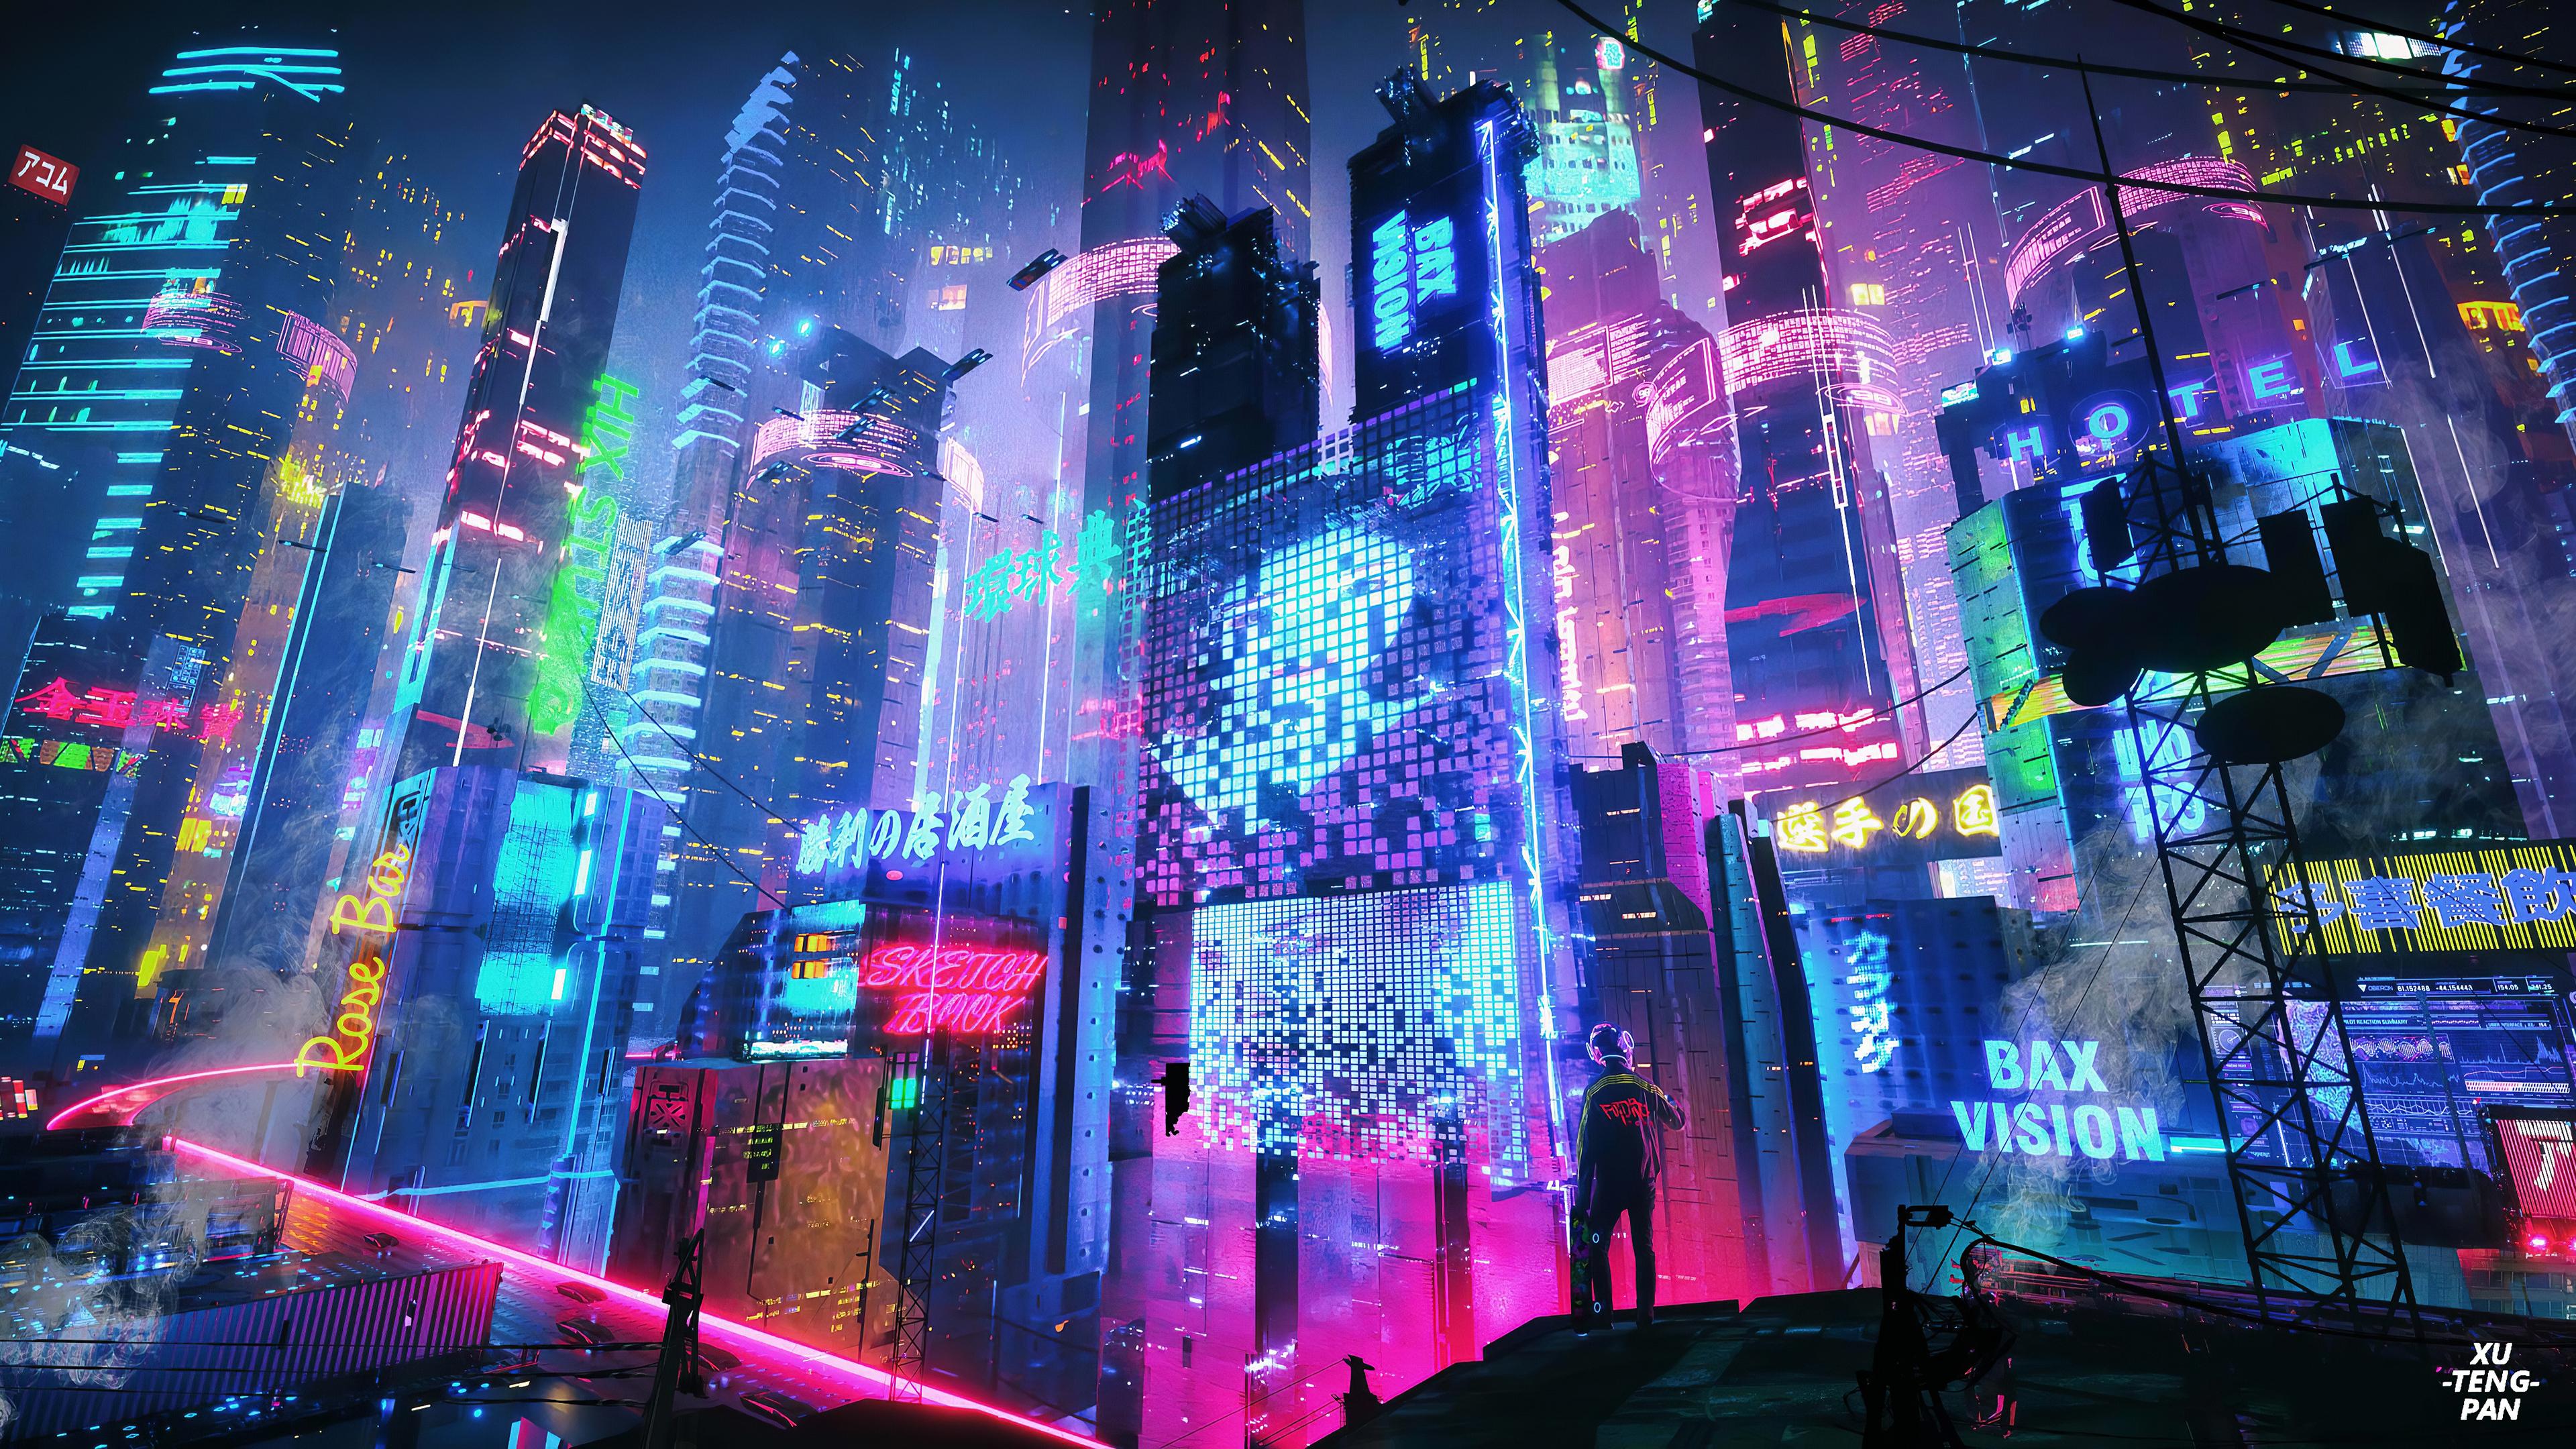 3840x2160 Colorful Neon City 4k 4k HD 4k Wallpapers ...